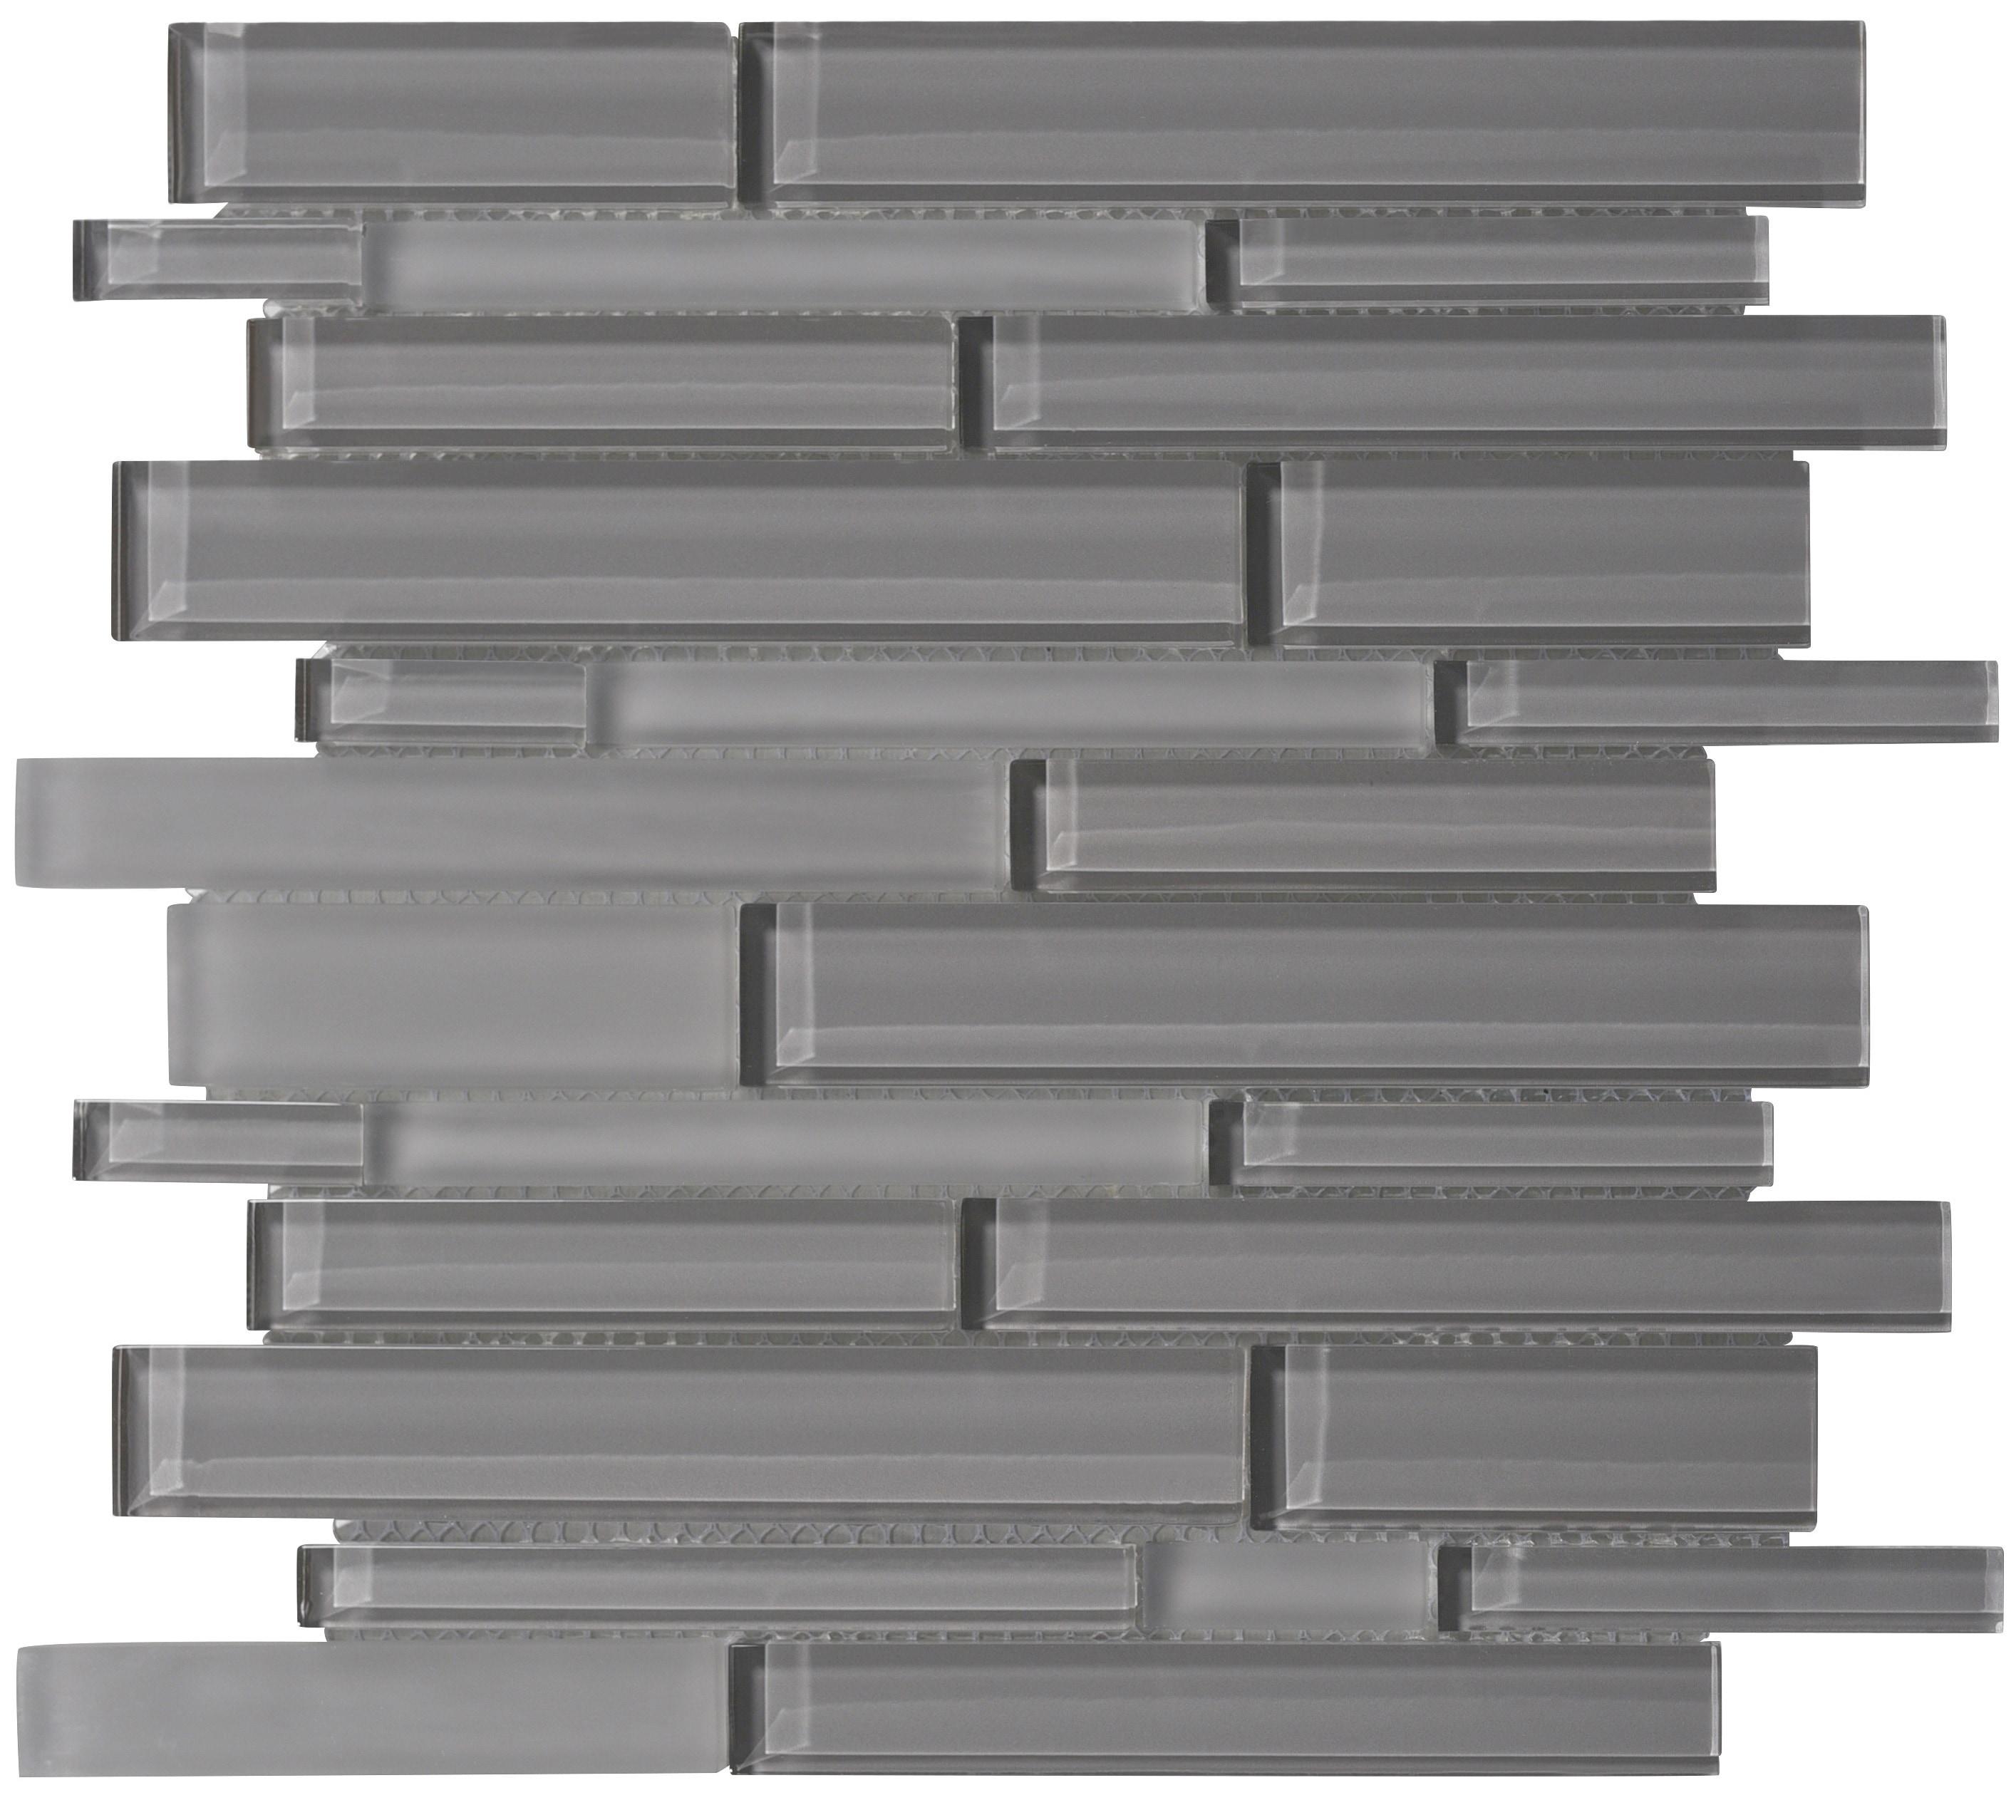 Glass Mosaic / 14 x 12 x 0.31 inches / Glossy Interlocking Random Sized Glass Mosaic Tile In Dark Gray 0